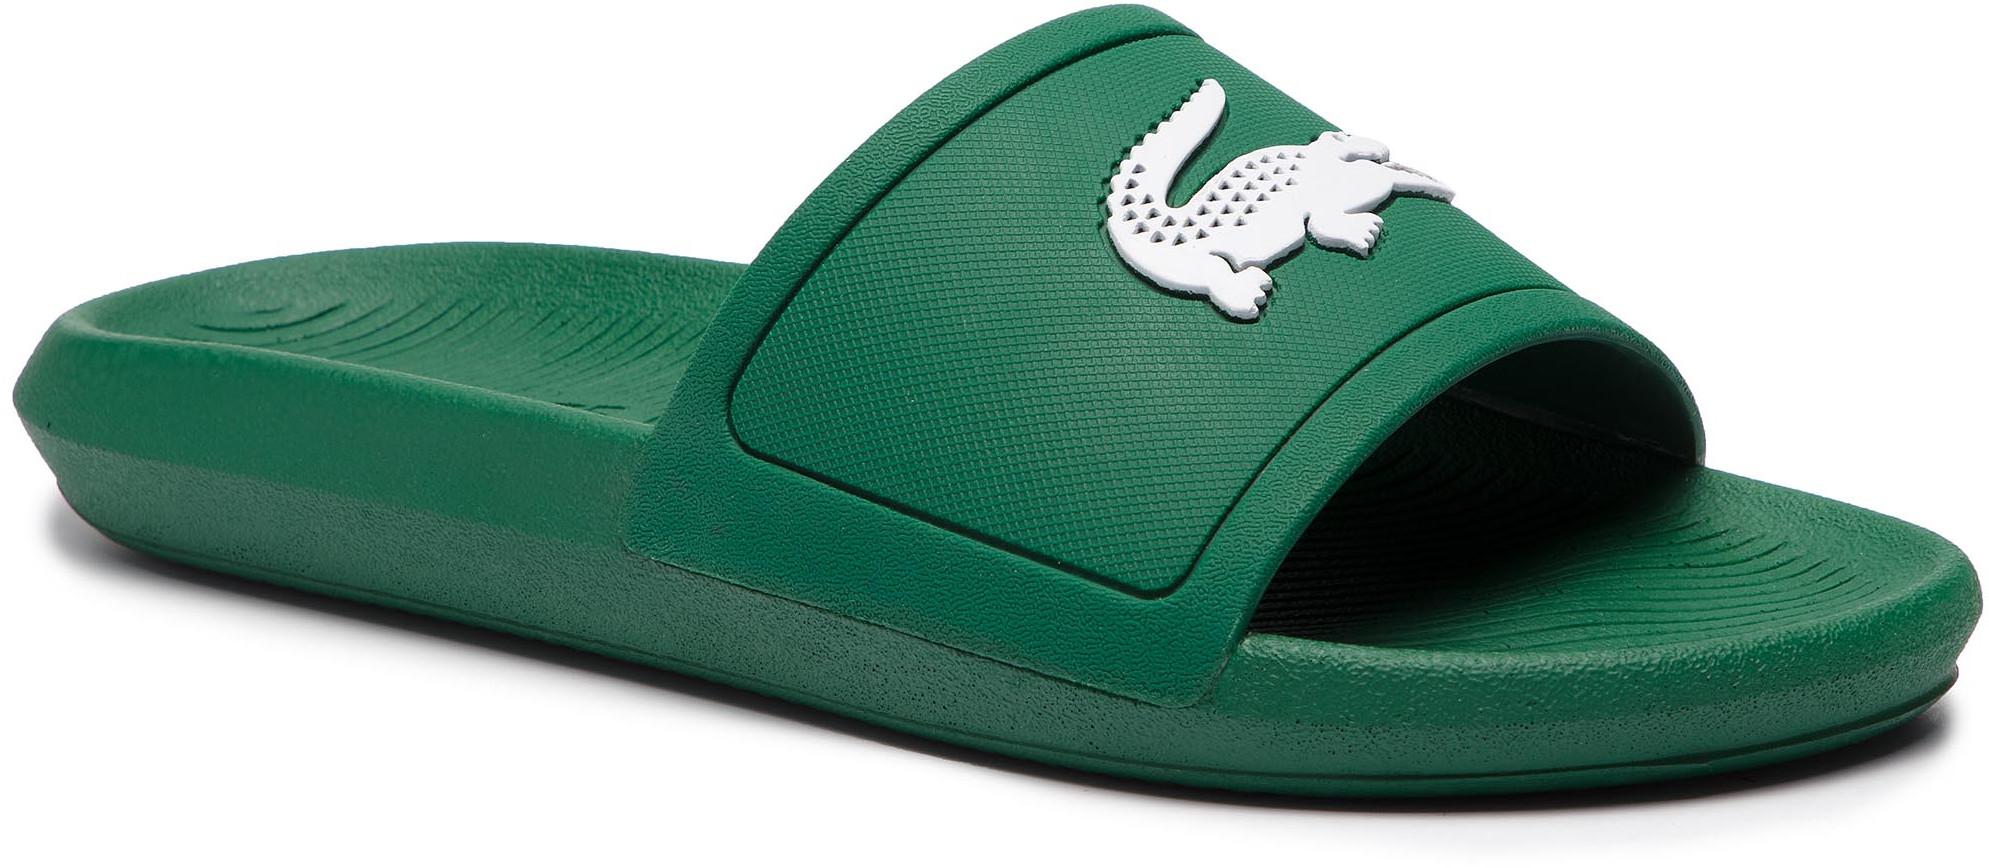 4833dbc0375f9 Lacoste Klapki Croco Slide 119 1 Cma 7-37CMA00181R7 Green/White